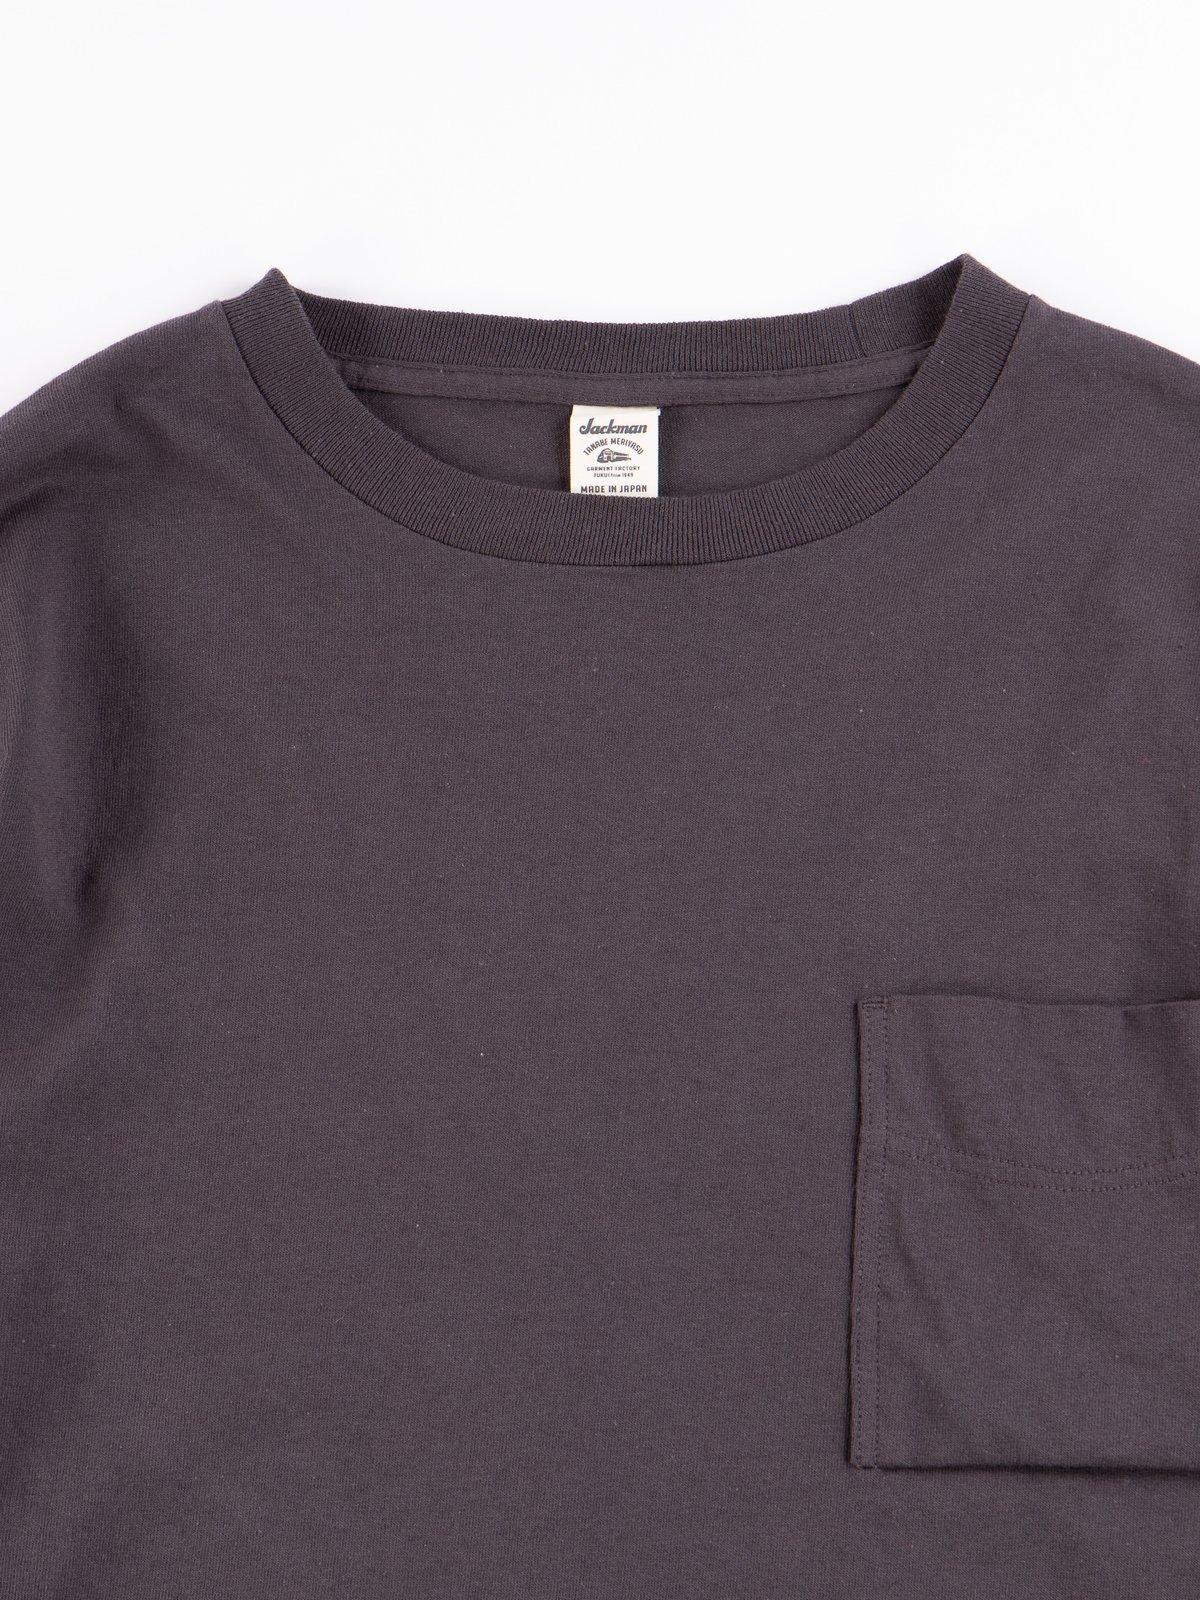 Off Black Long Sleeve Pocket T–Shirt - Image 3